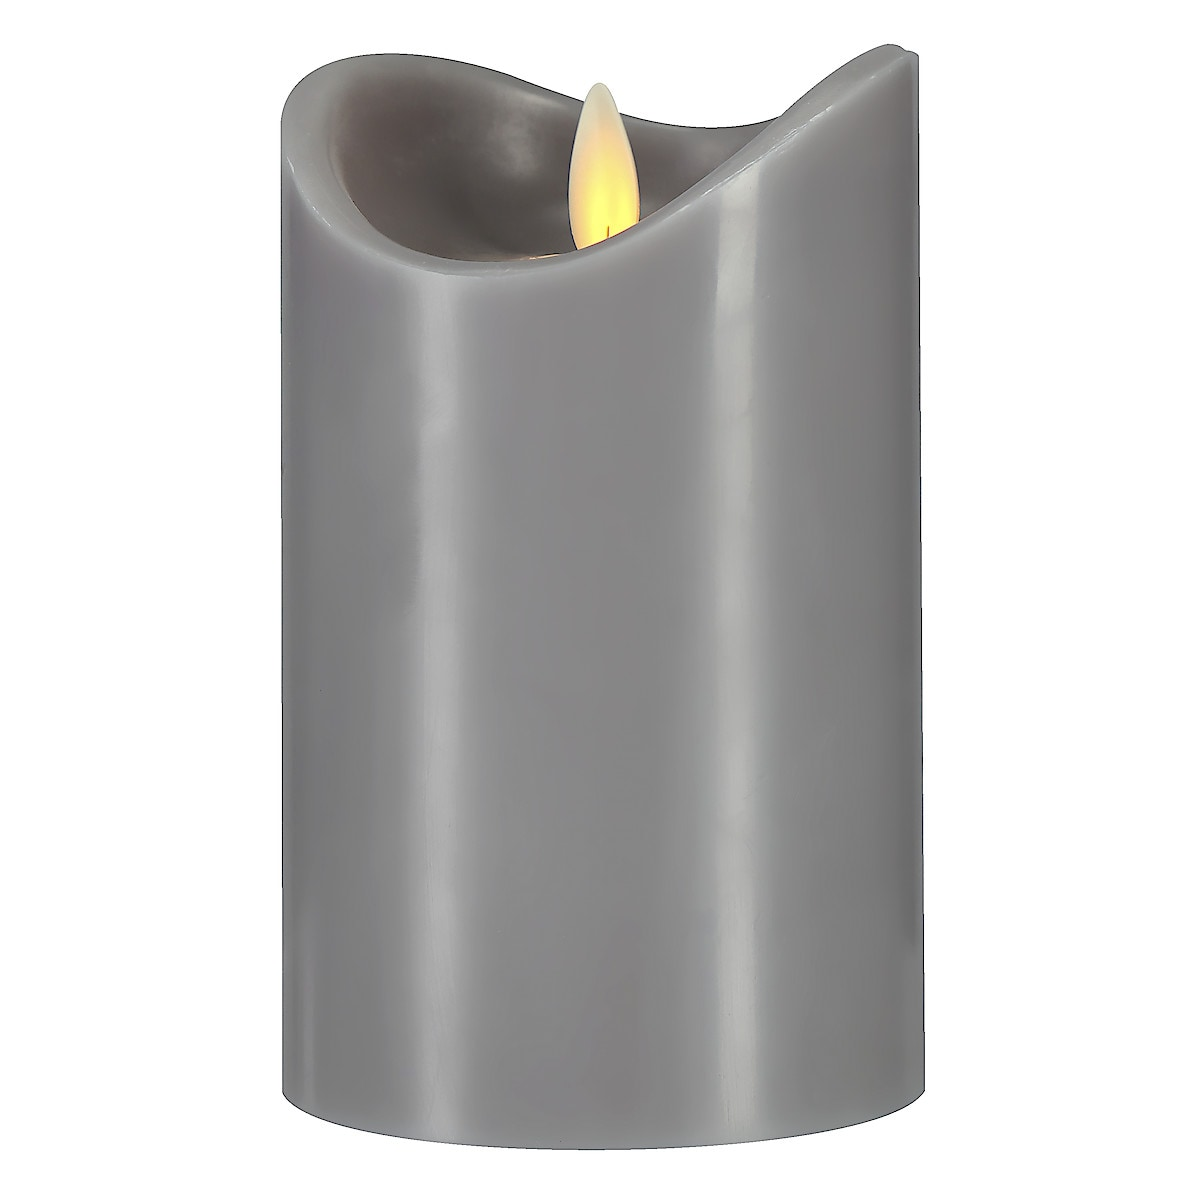 LED-kubbelys med flamme, 13 cm